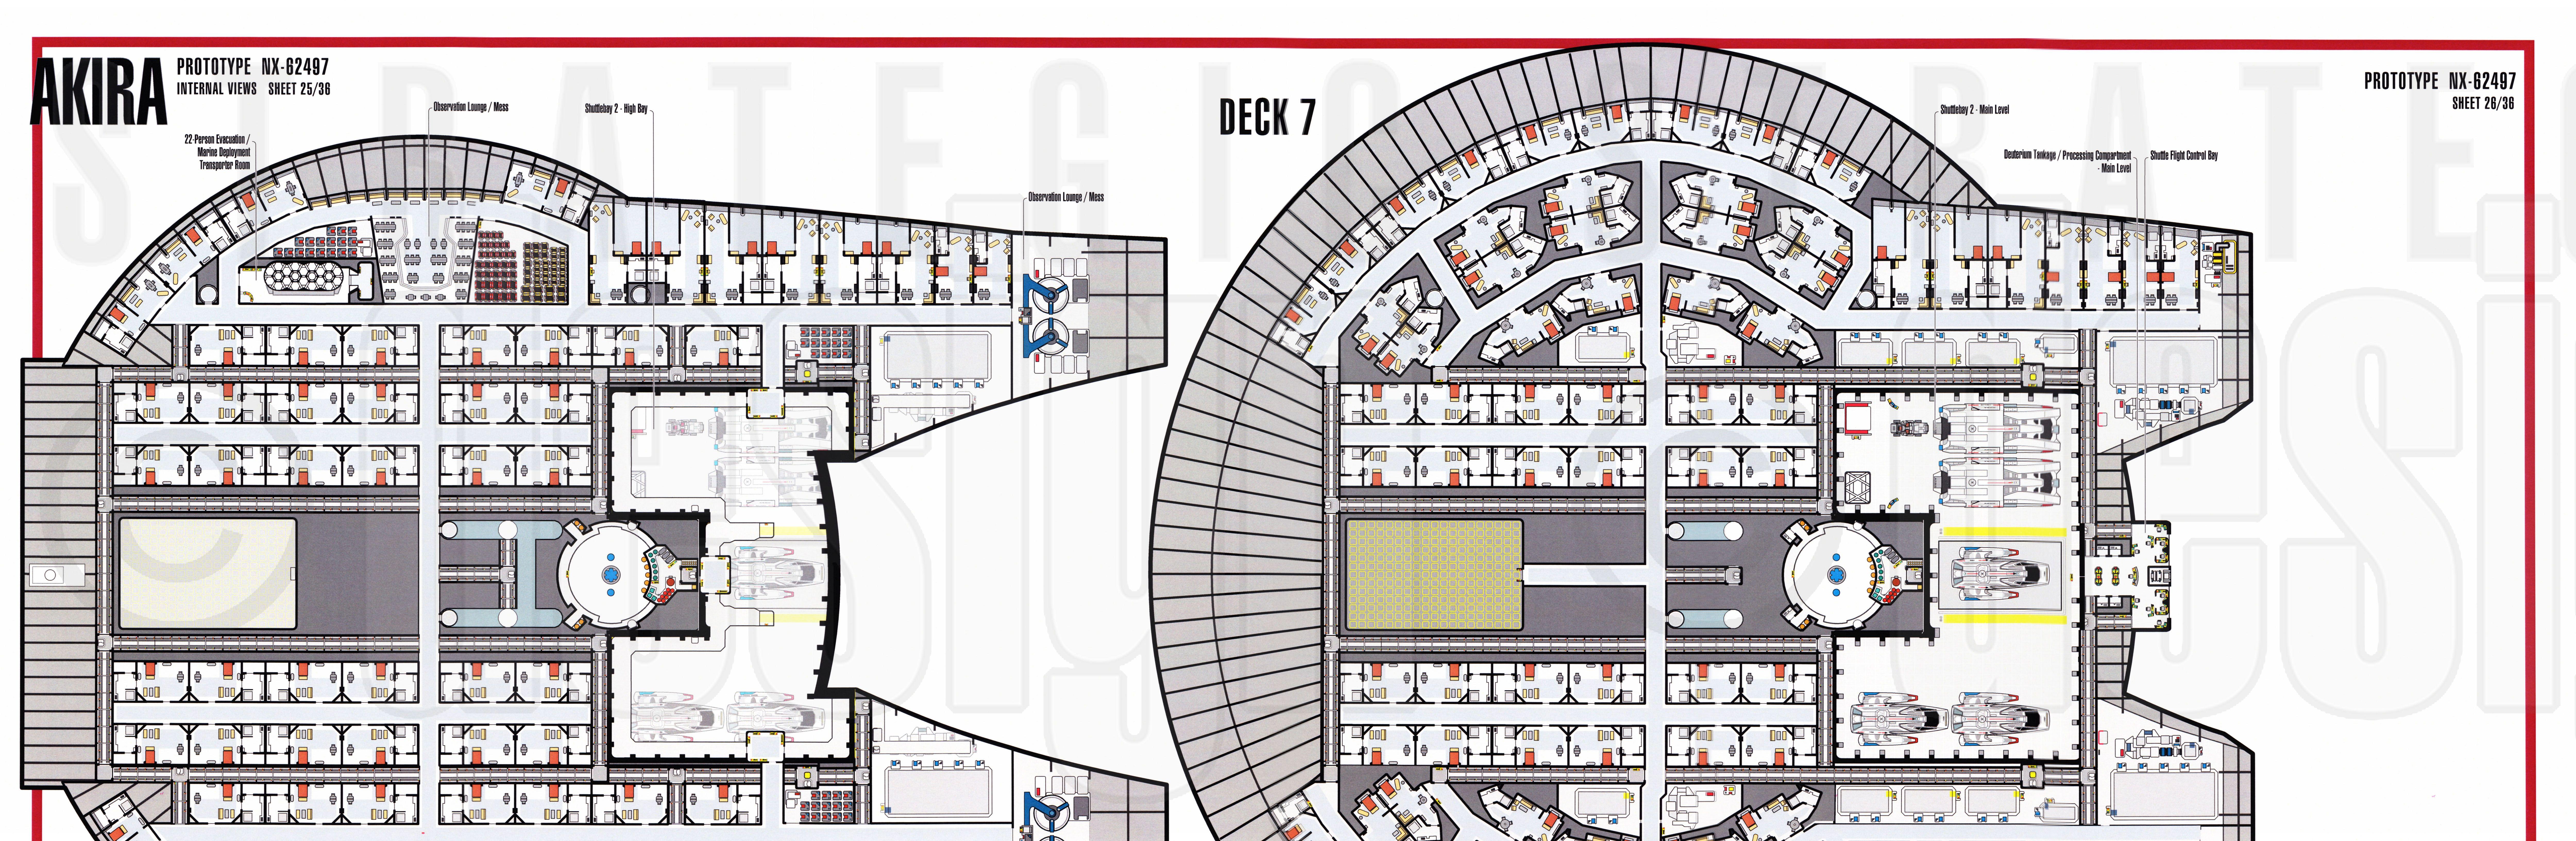 Photo Ncc 1701 Deck Plans Images Patio Rocking Chairs